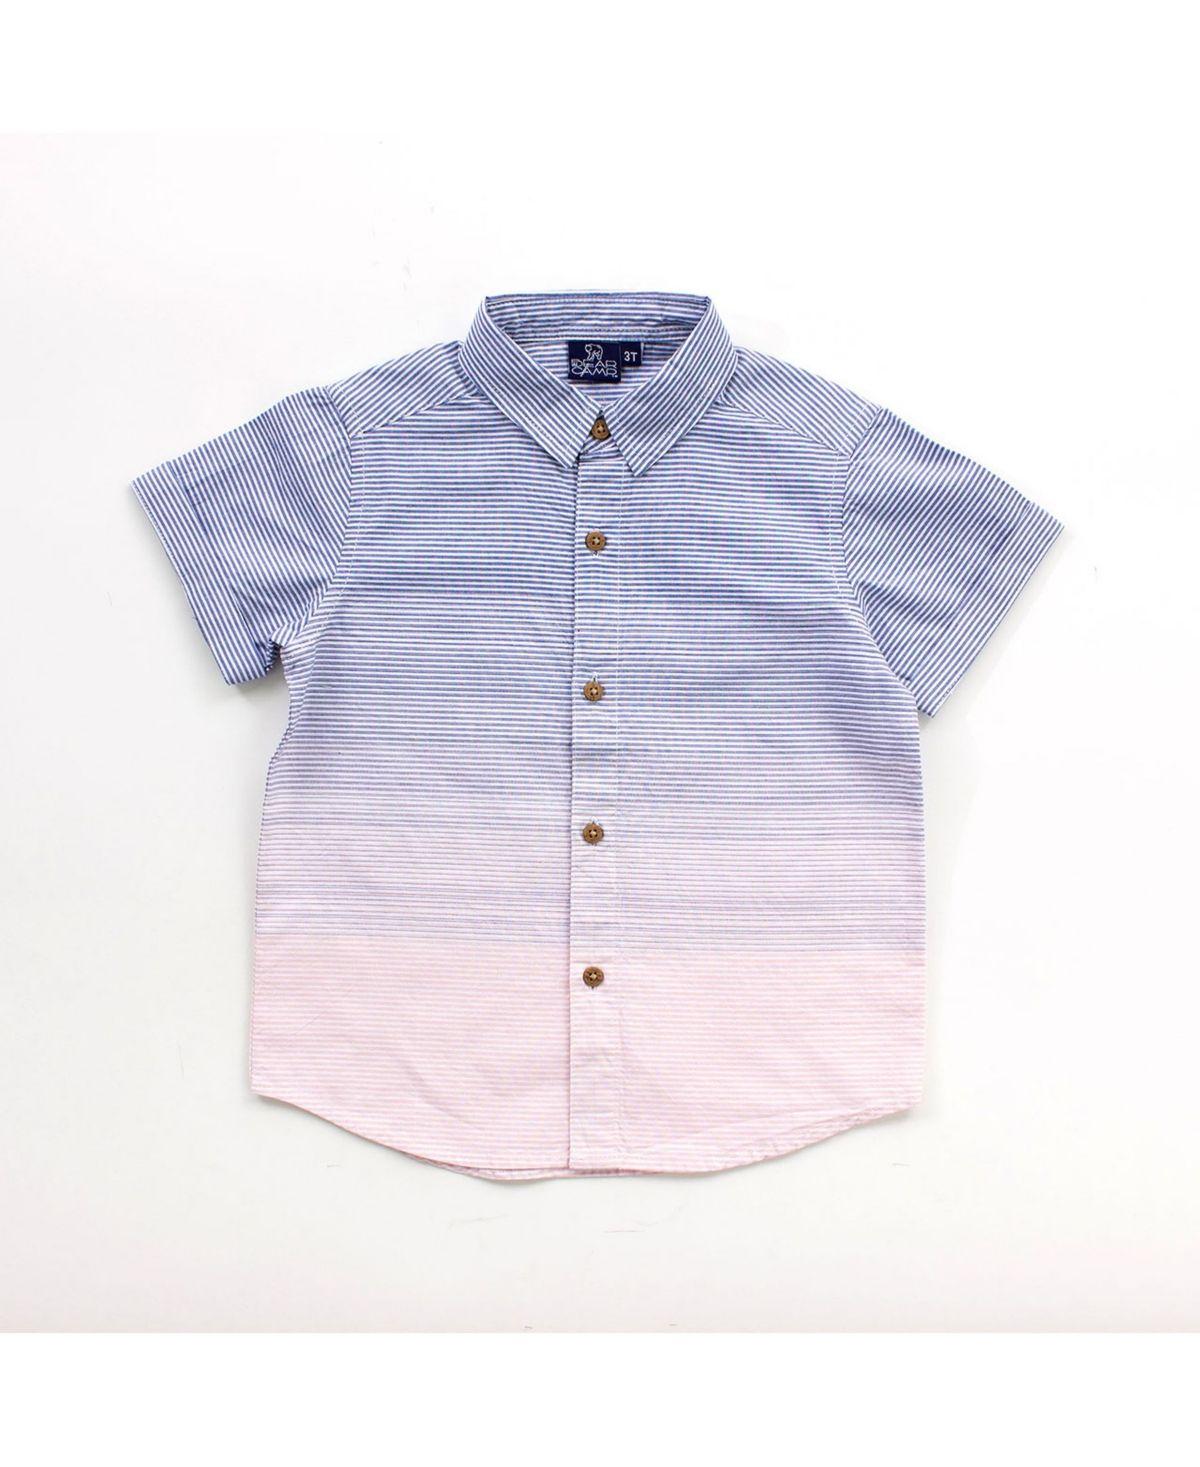 Pin By Jolene Namatovu On Tina S Boys Clothes Toddler Boy Dress Shirts Boys Dress Shirts Print Buttons [ 1467 x 1200 Pixel ]